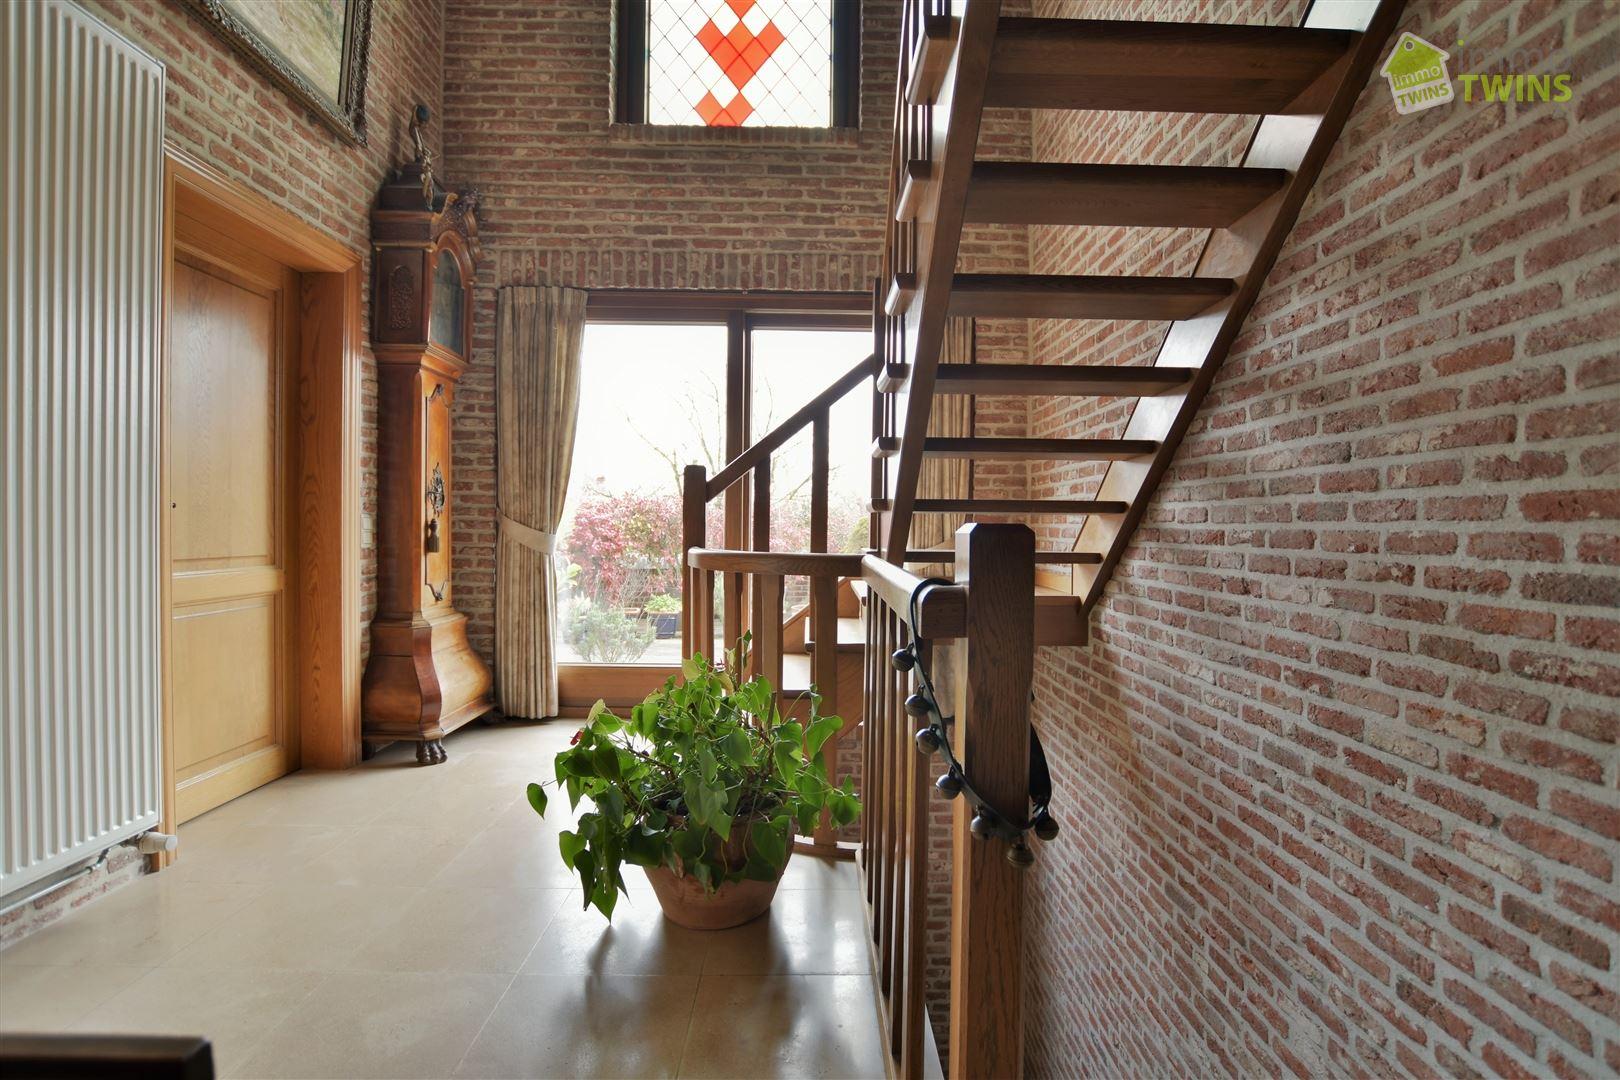 Foto 17 : Duplex/triplex te 9200 Dendermonde (België) - Prijs € 398.000